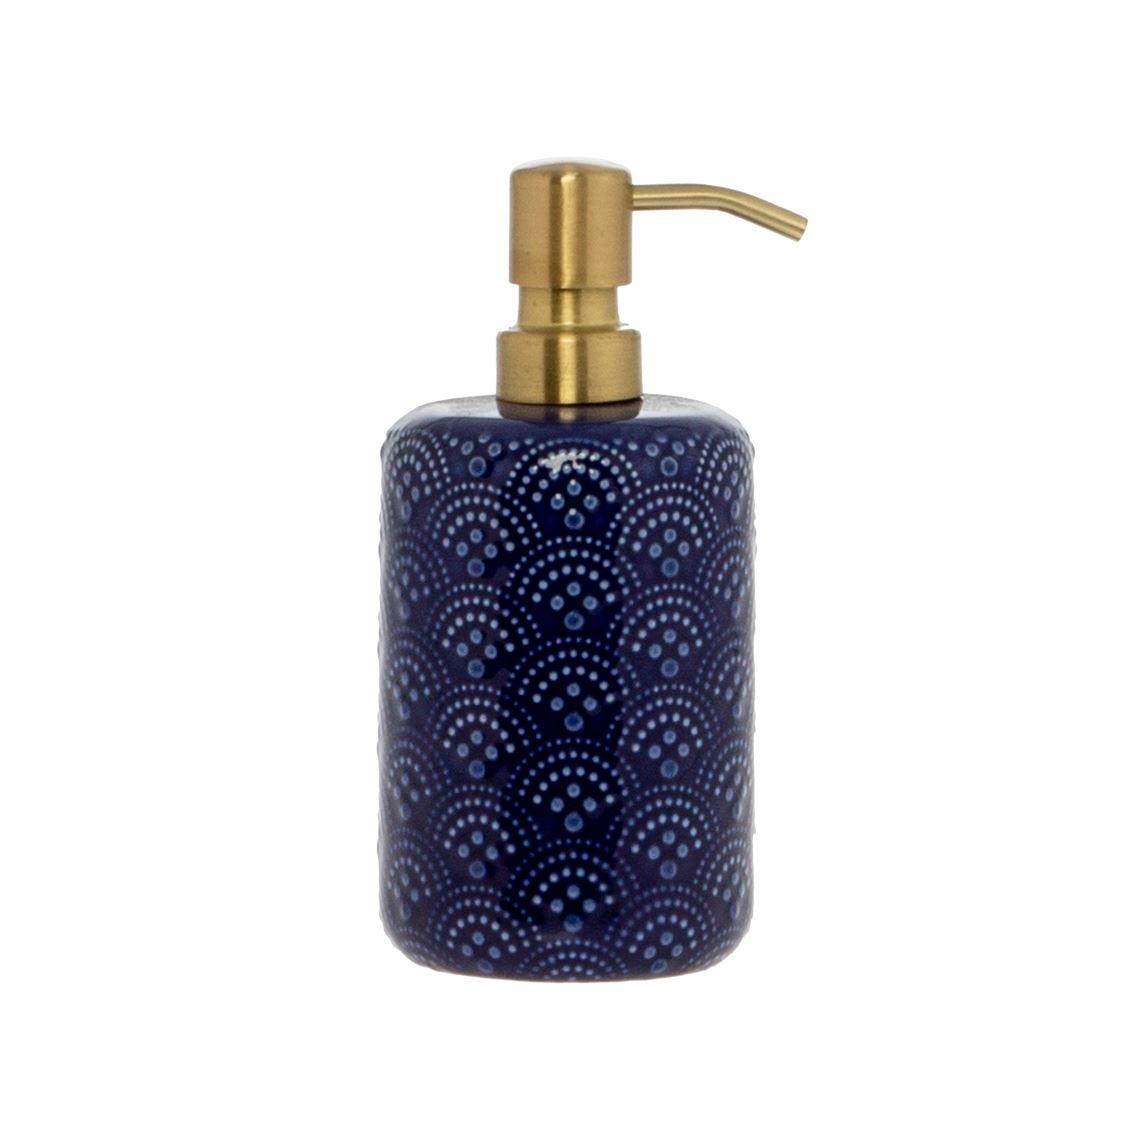 Anne Soap Dispenser Size W 8cm x D 8cm x H 18cm in Blue Freedom